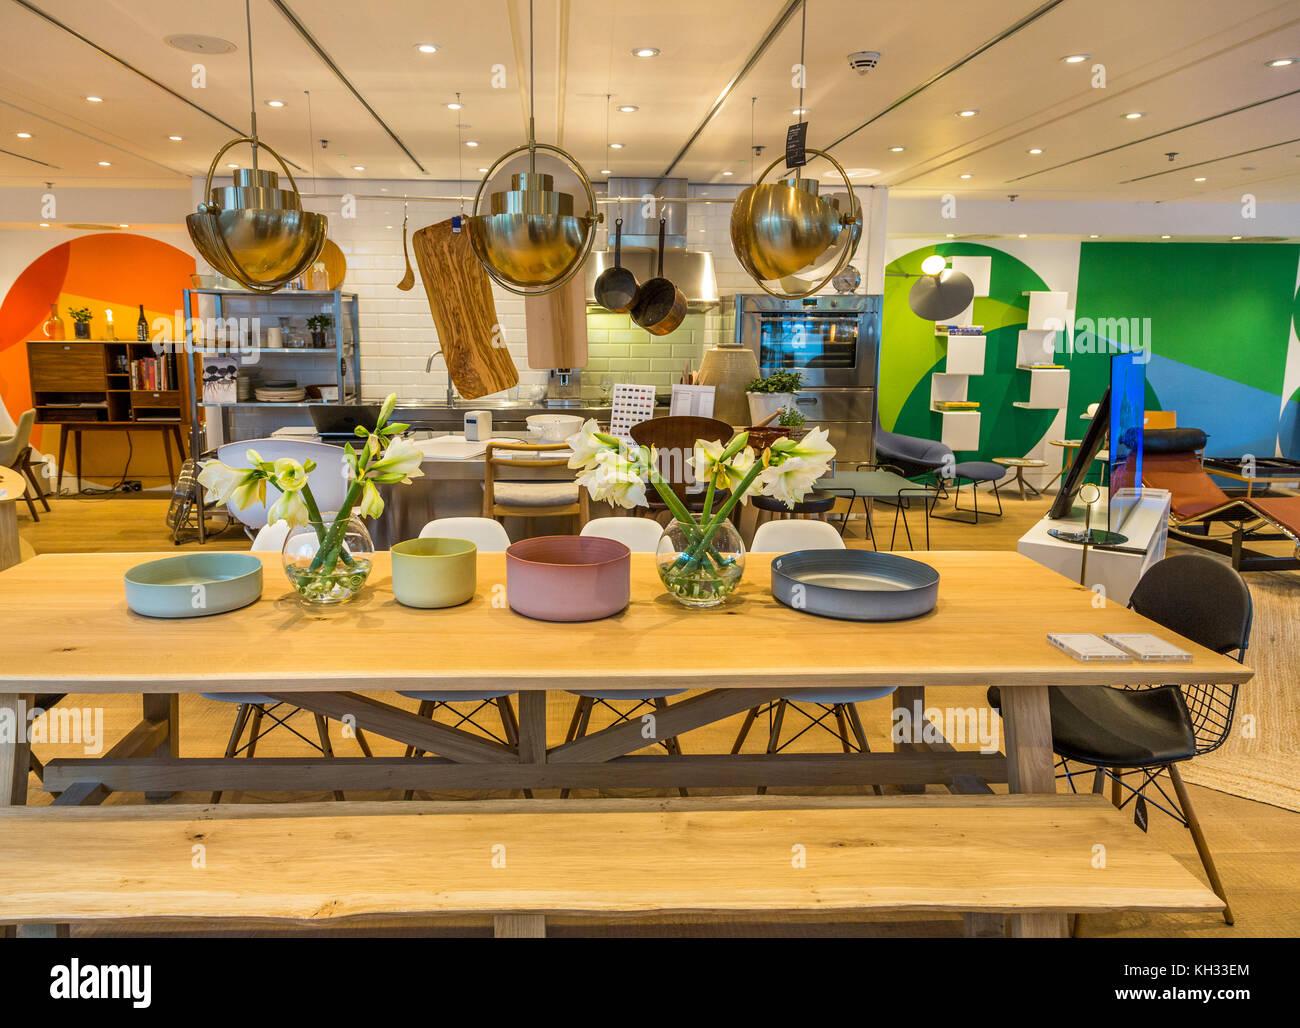 The Conran Shop Interior , Upmarket Homewares, Lighting, Furniture,  Emporium On Marleybone High